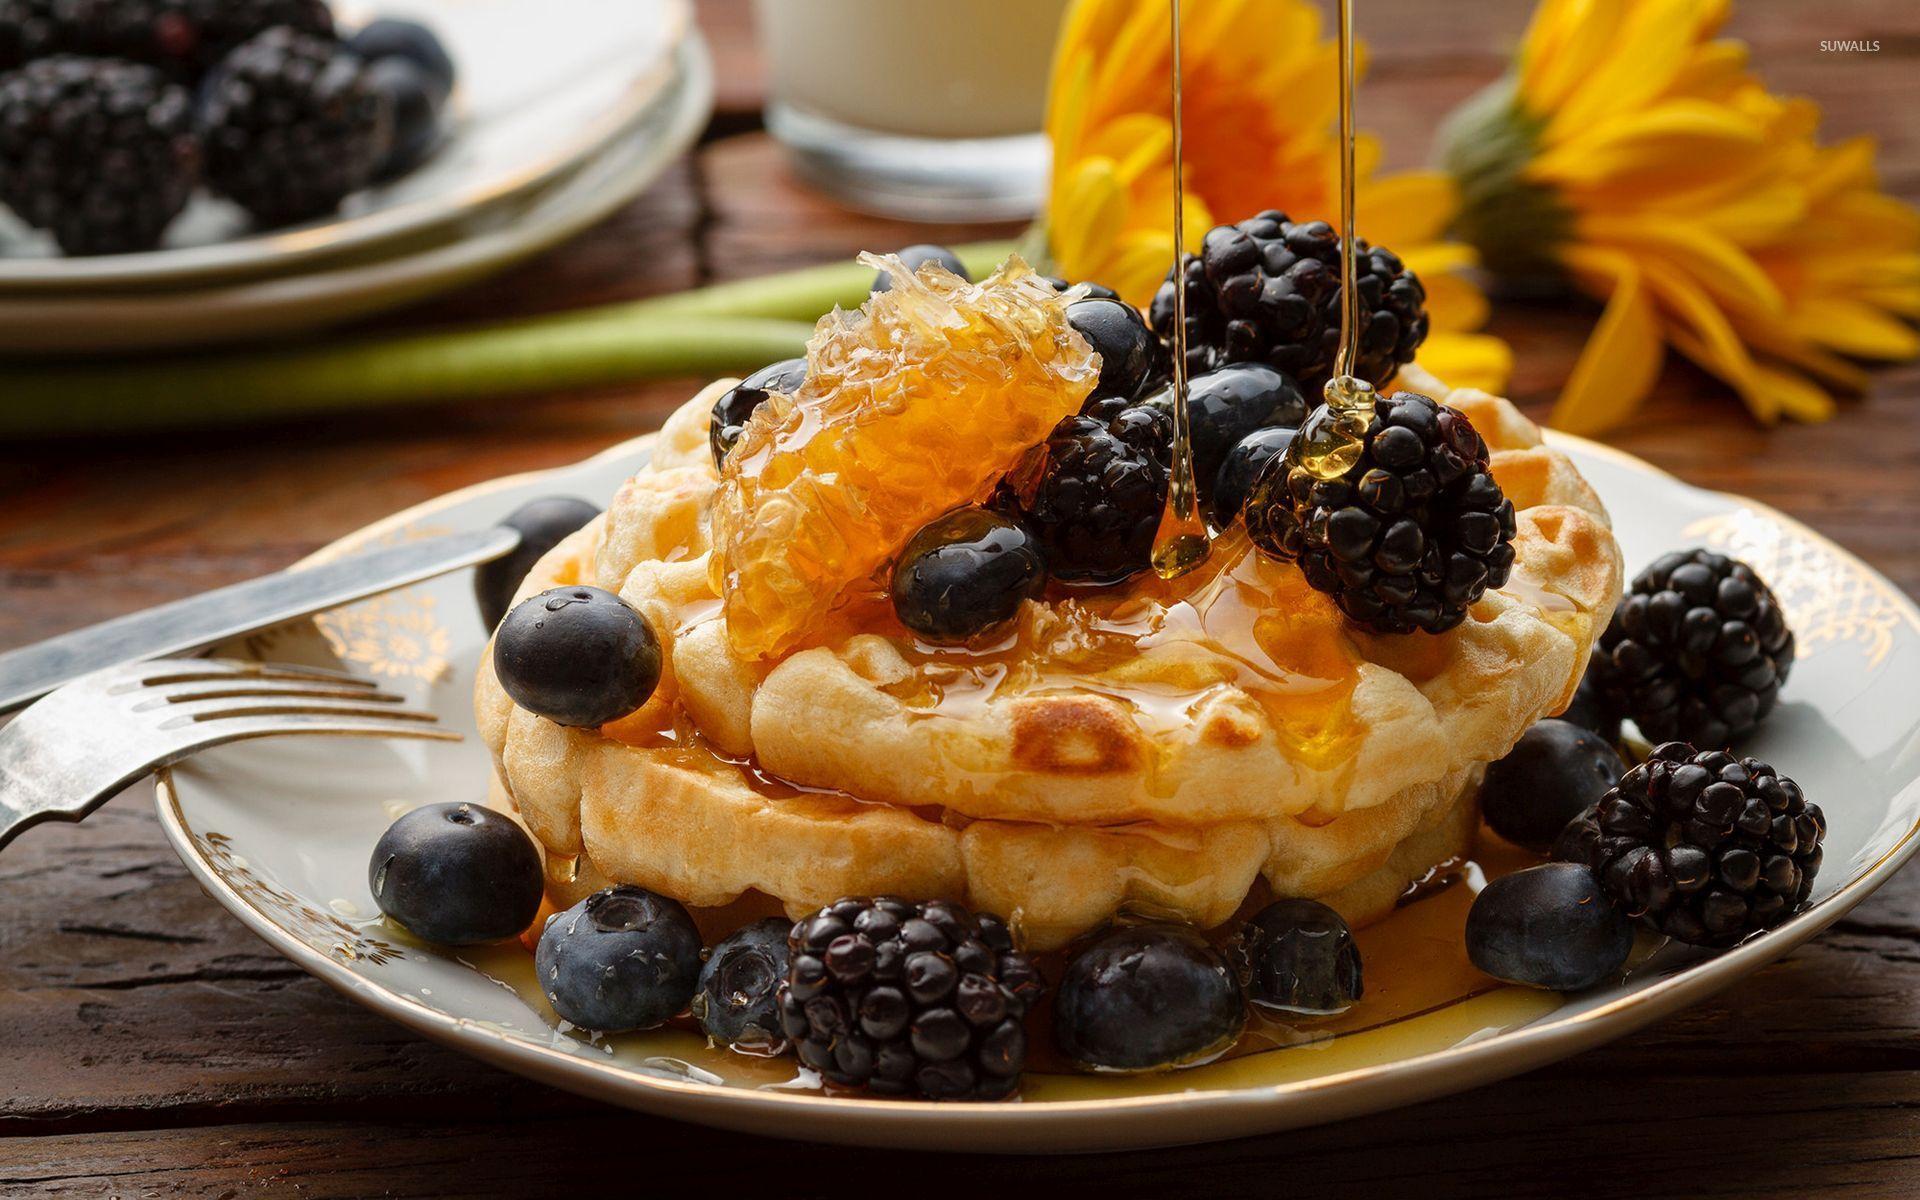 waffles wallpaper 2560x1600 - photo #4